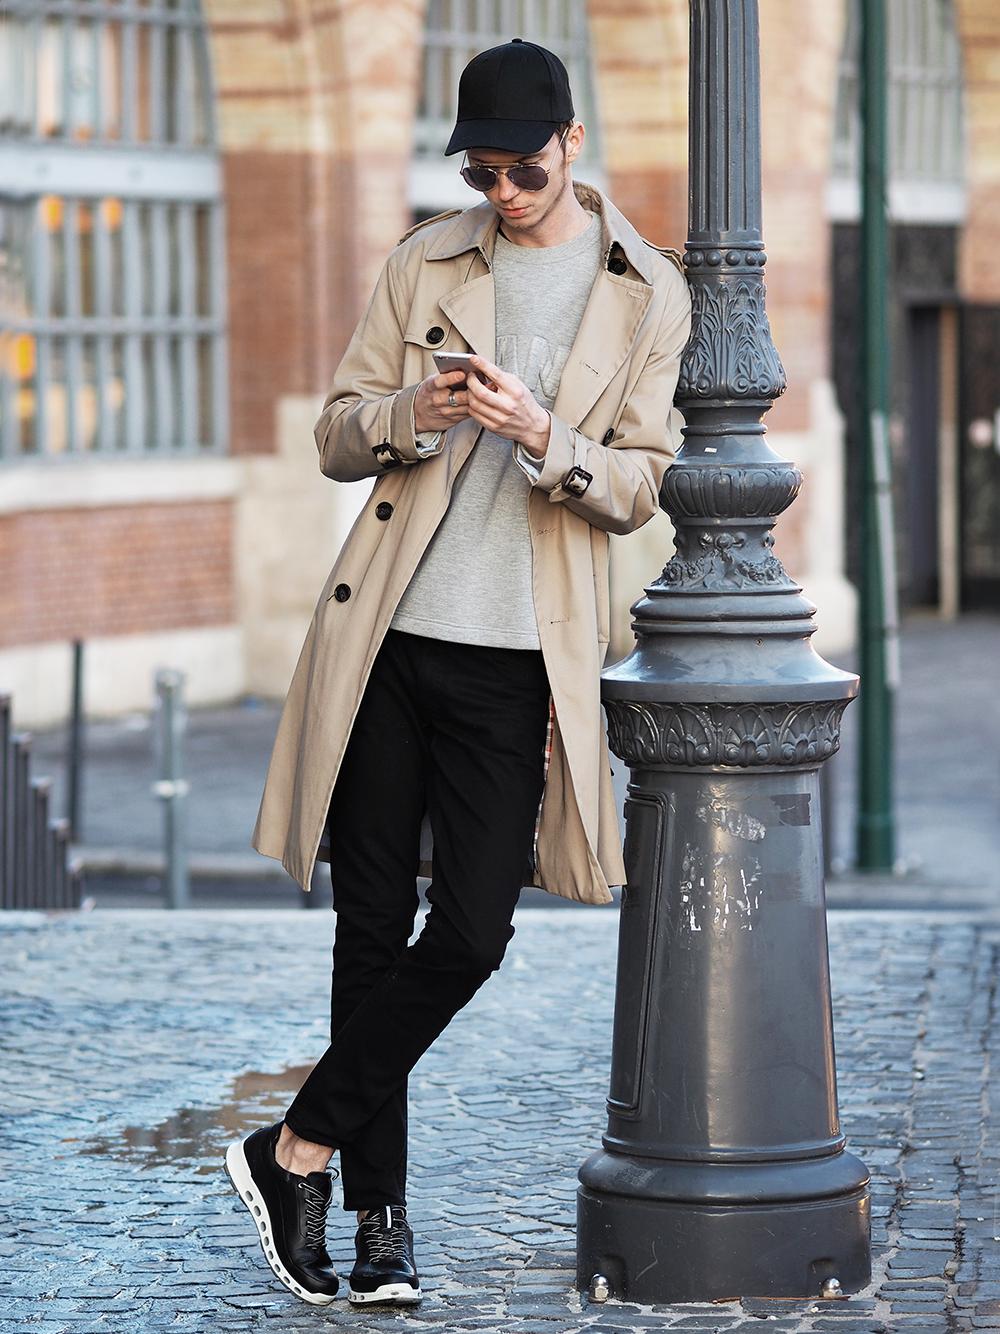 ecco-cipo-ferfi-street-style-ferfidivat-blogger-divatblogger-chaby-smizedivat_4_1.png